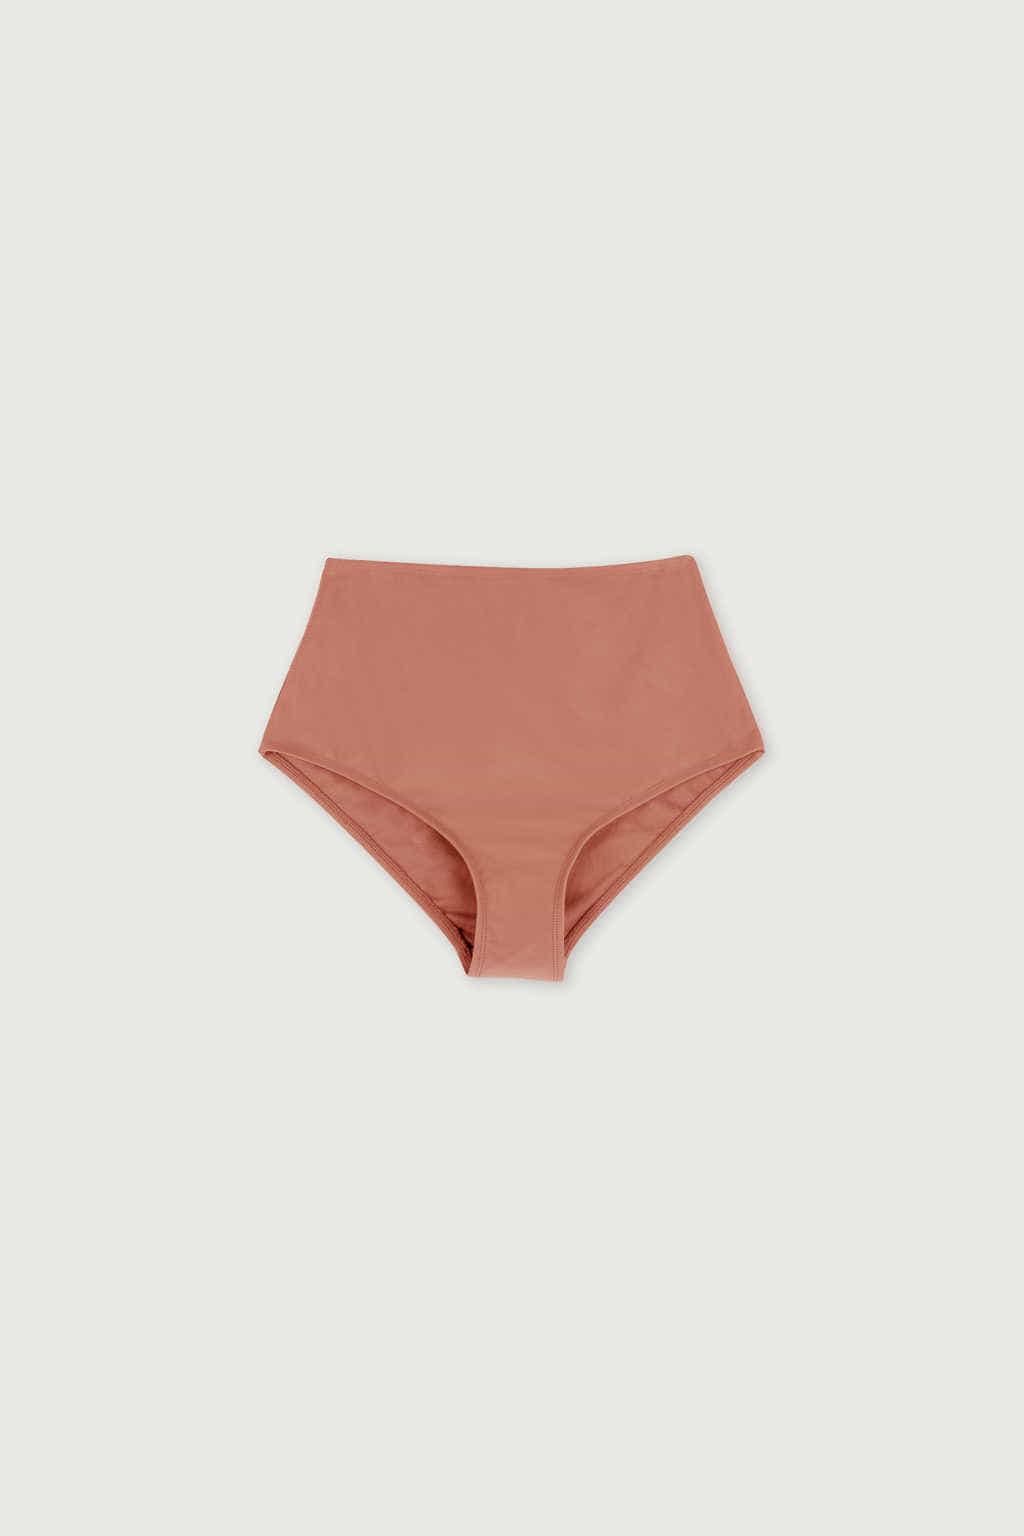 Bikini Bottom 2906 Terracotta 2